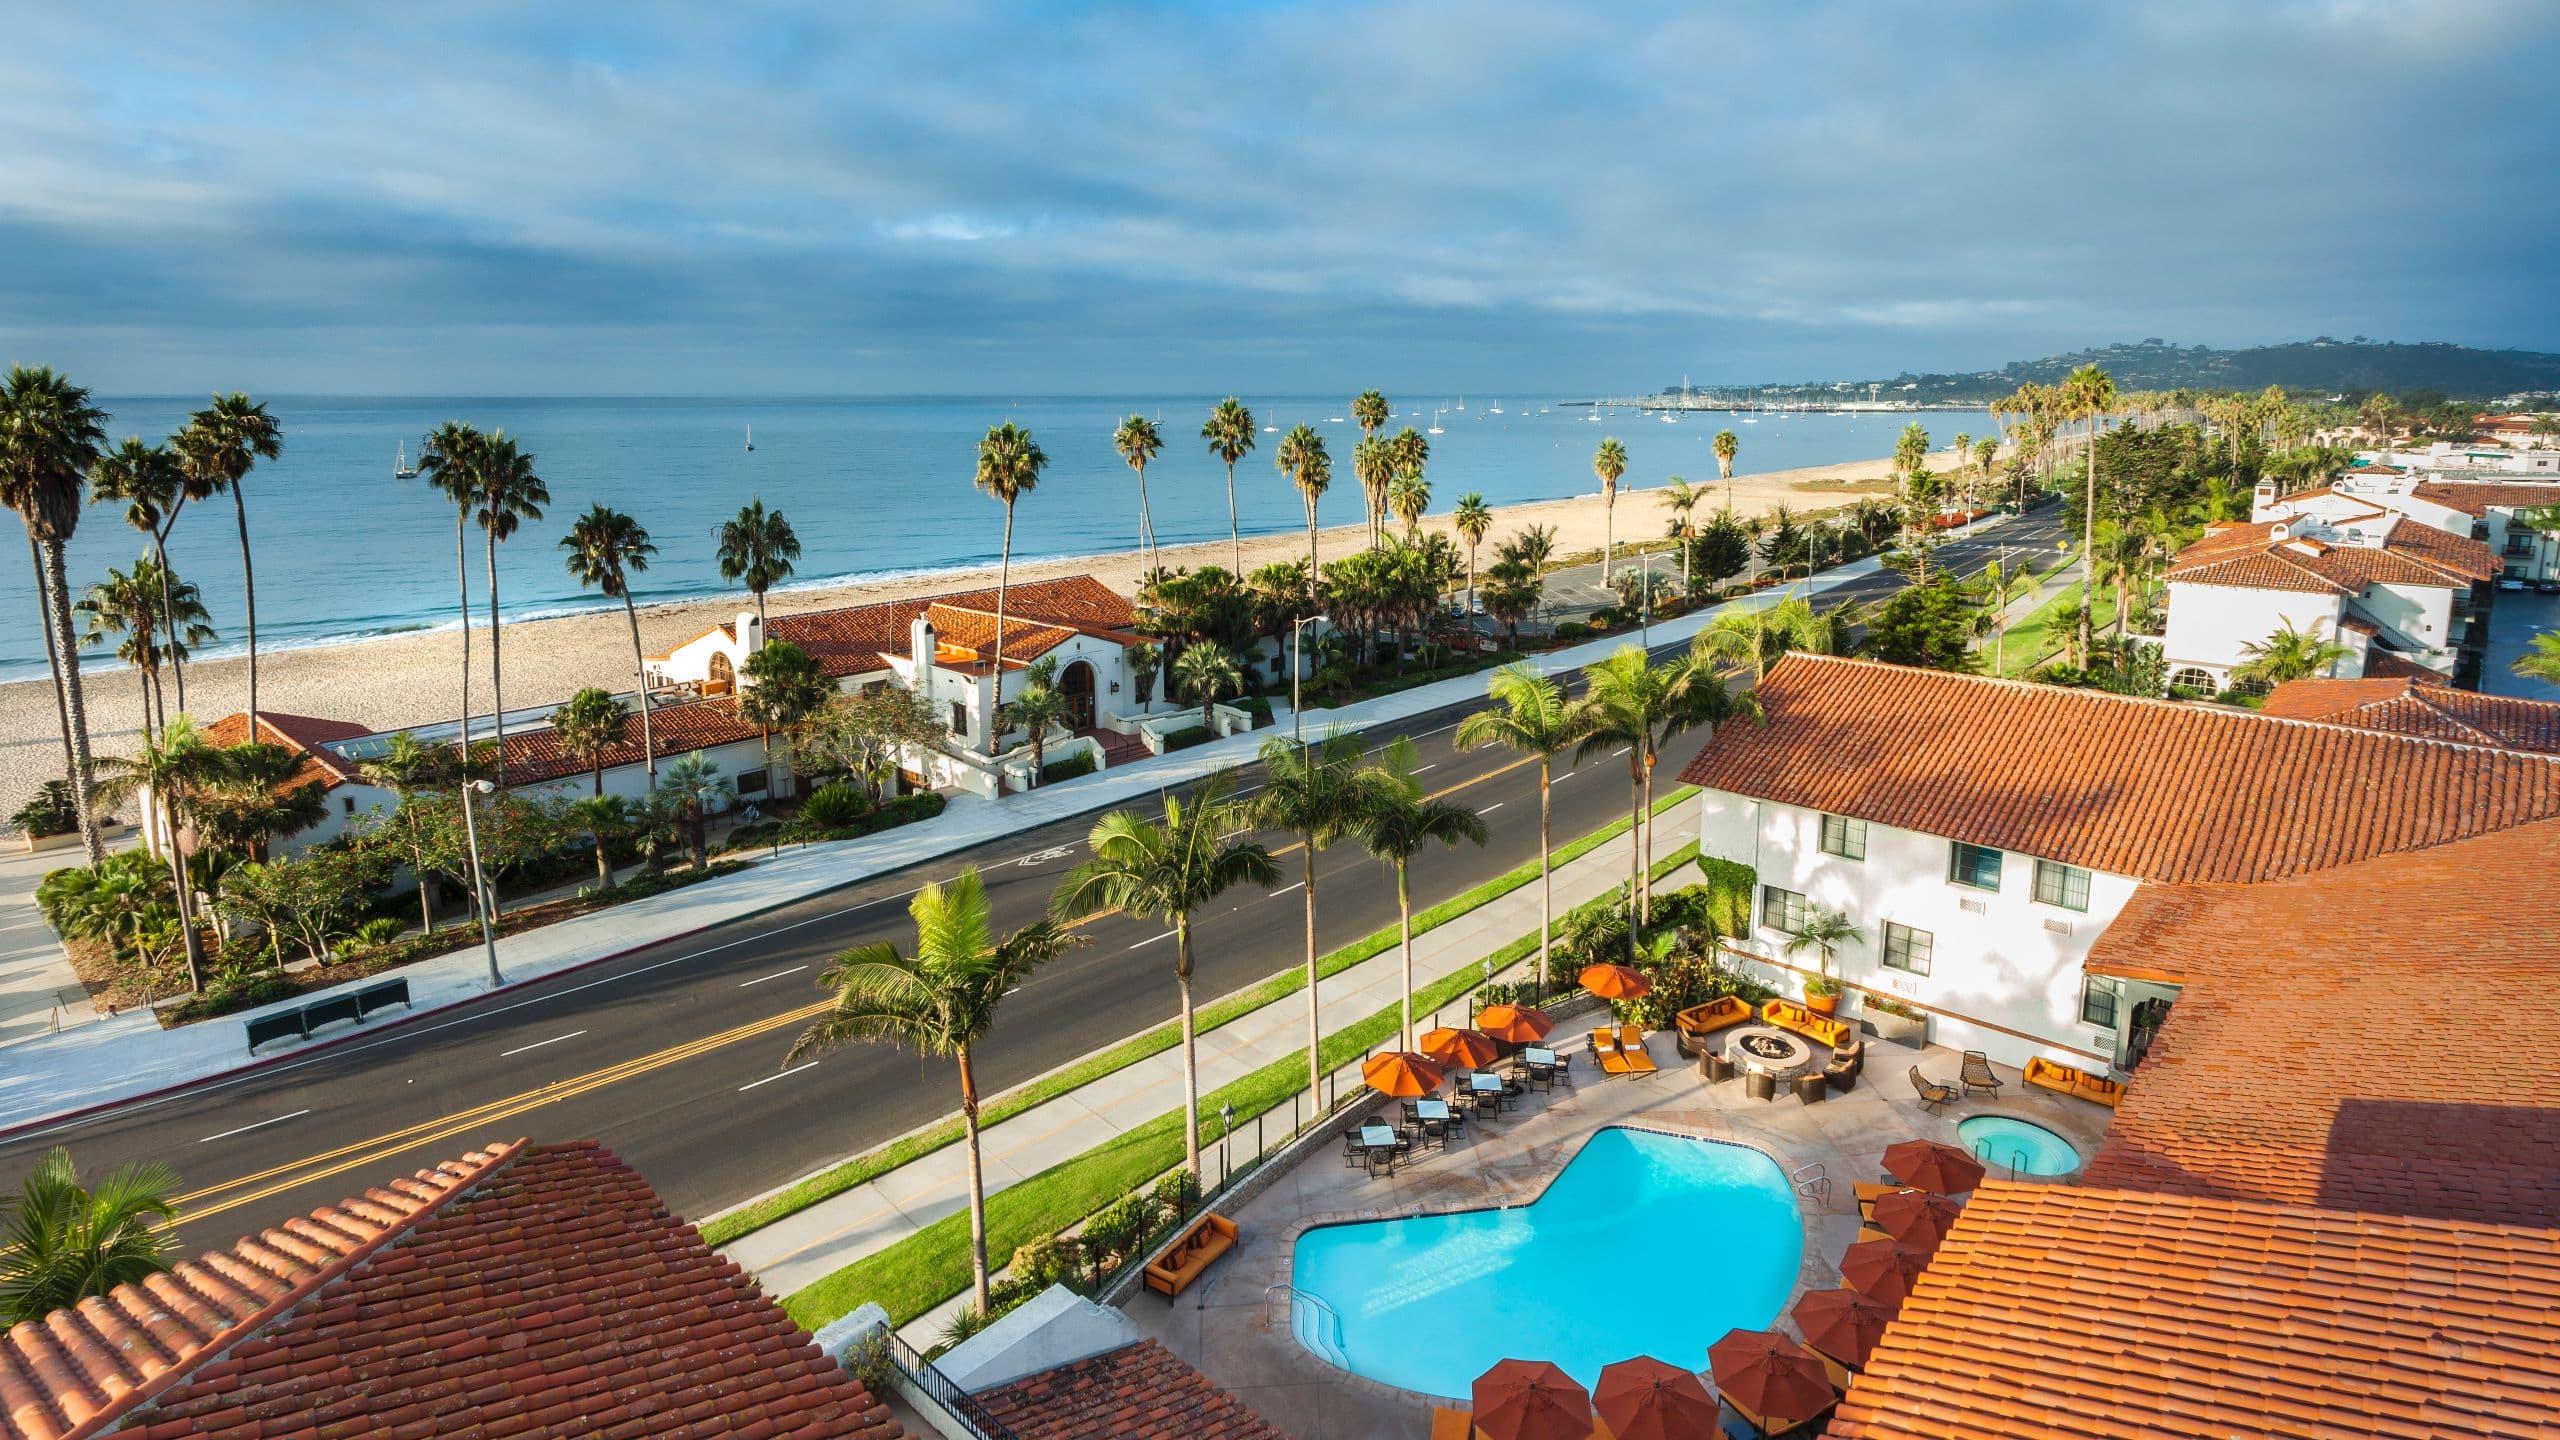 Hotels In Santa Barbara >> Beachfront Santa Barbara Hotel Hyatt Centric Santa Barbara